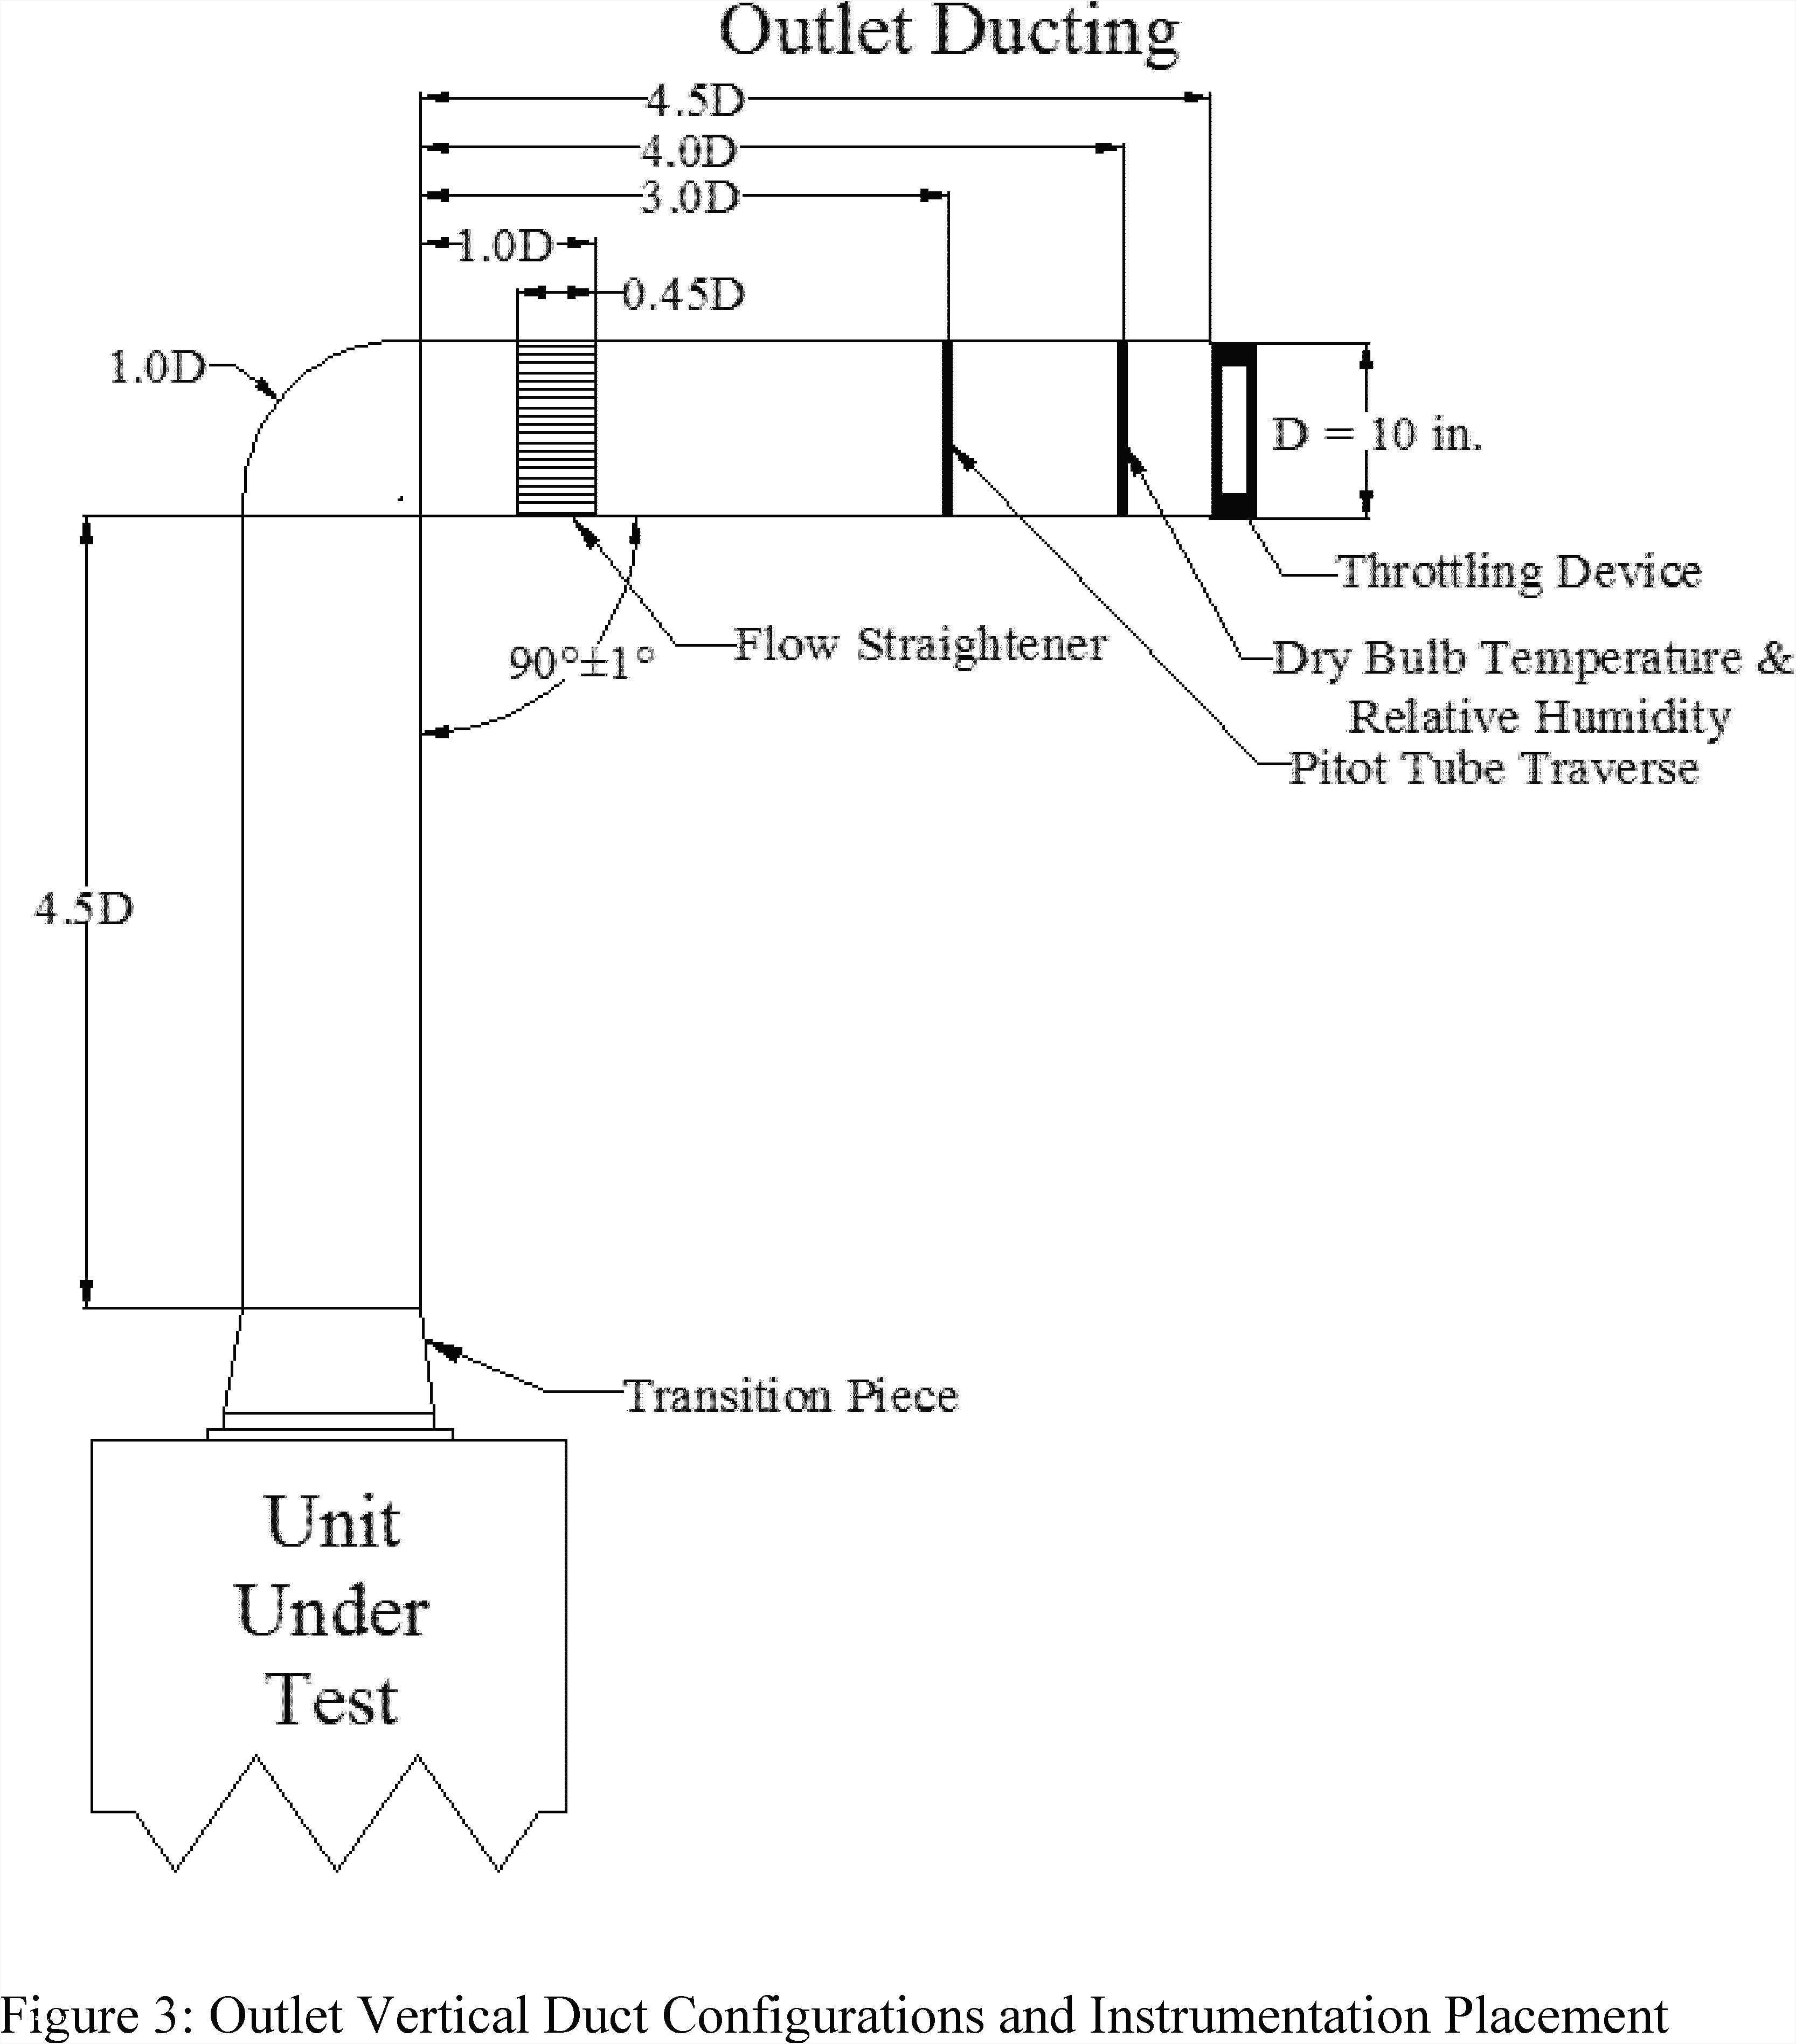 Drawing A Cartoon Rocket Easy to Draw Microscope soaring Rocket Ship Cartoon Icon Sketch Fast